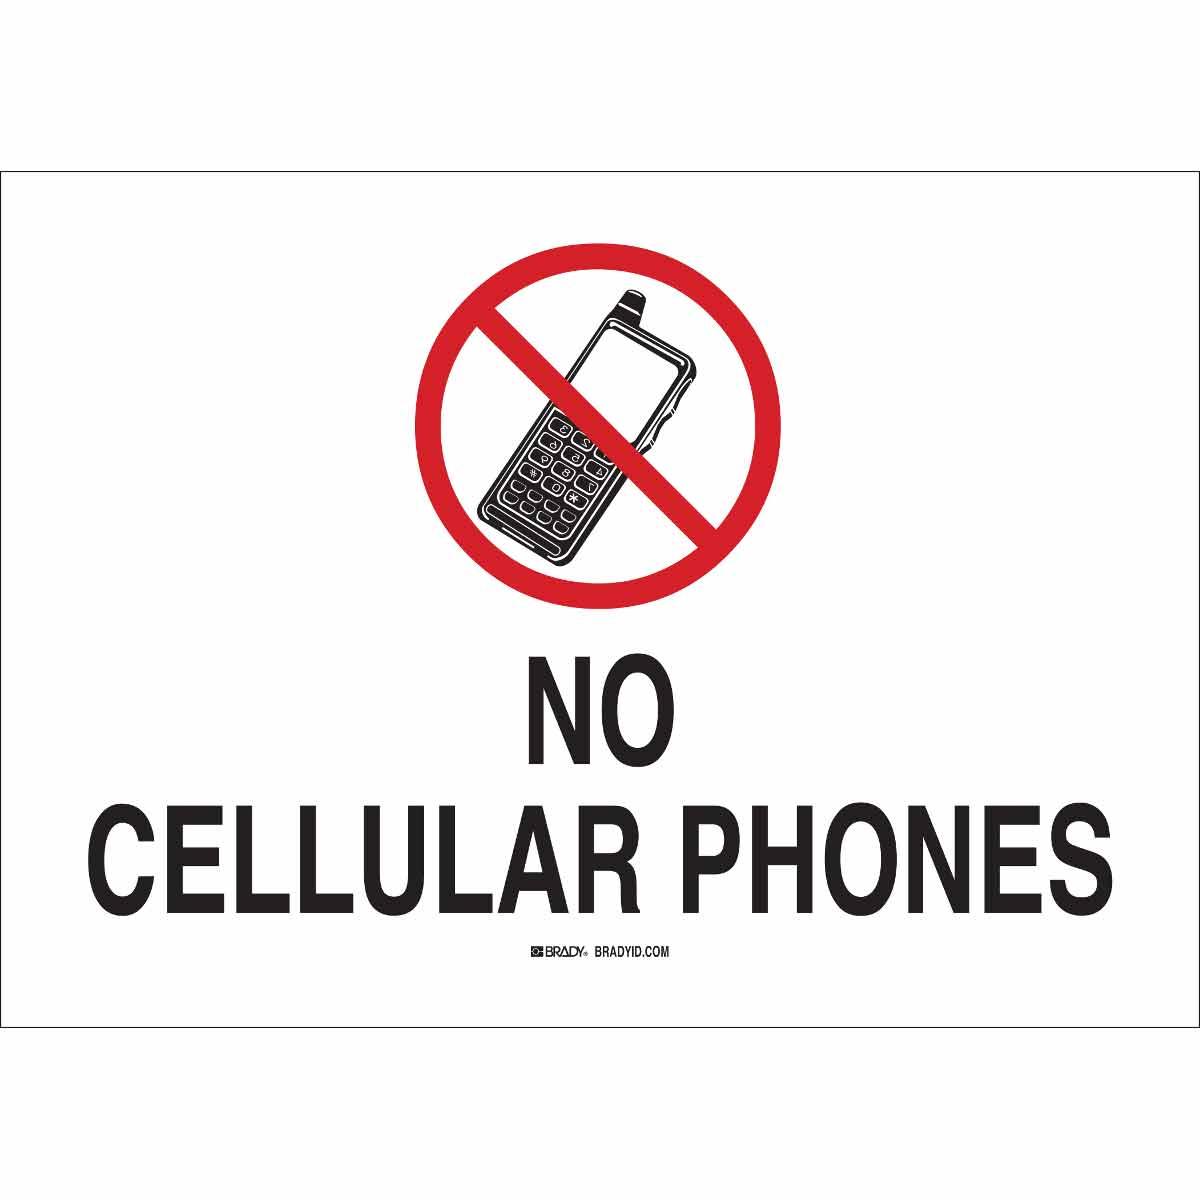 Brady® 95503 Rectangular No Cellular Sign, 10 in H x 14 in W, Black/Red on White, B-401 Polystyrene, Corner Holes Mount